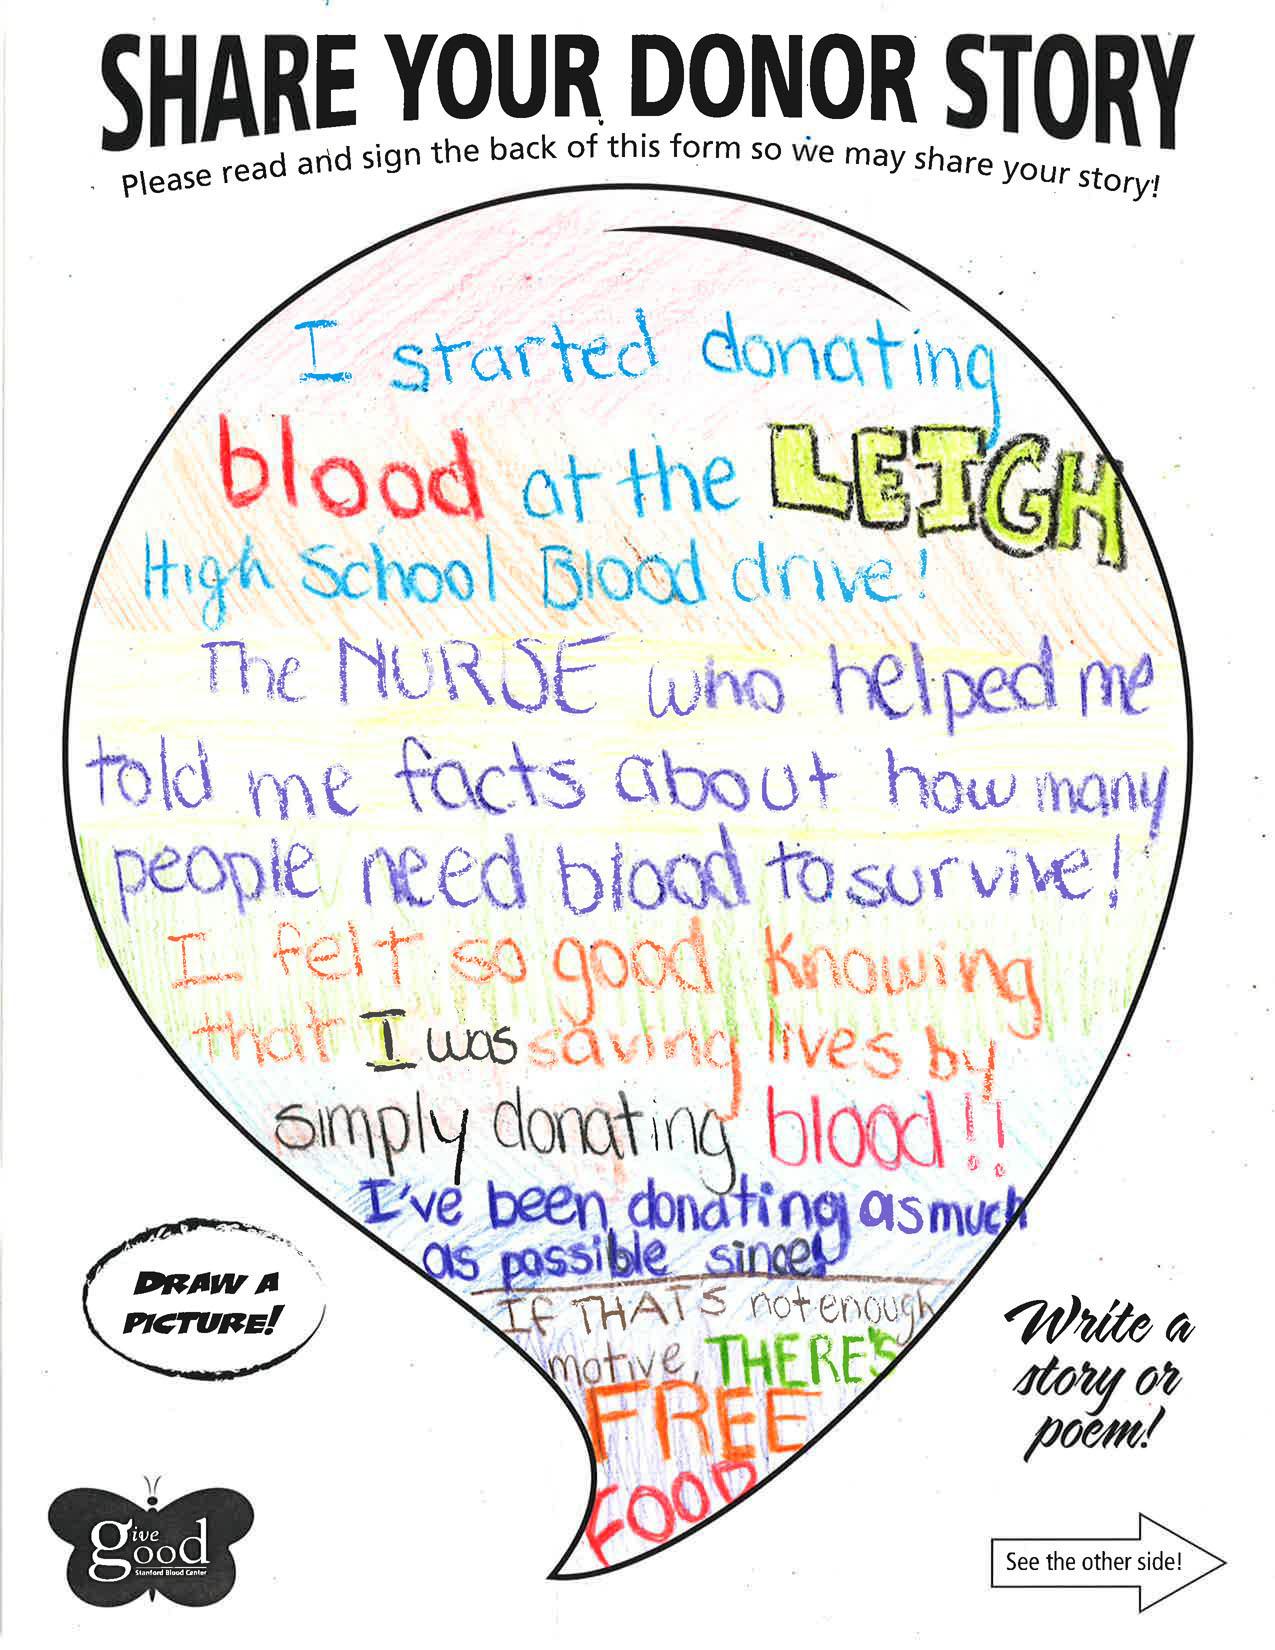 Emileigh's Story